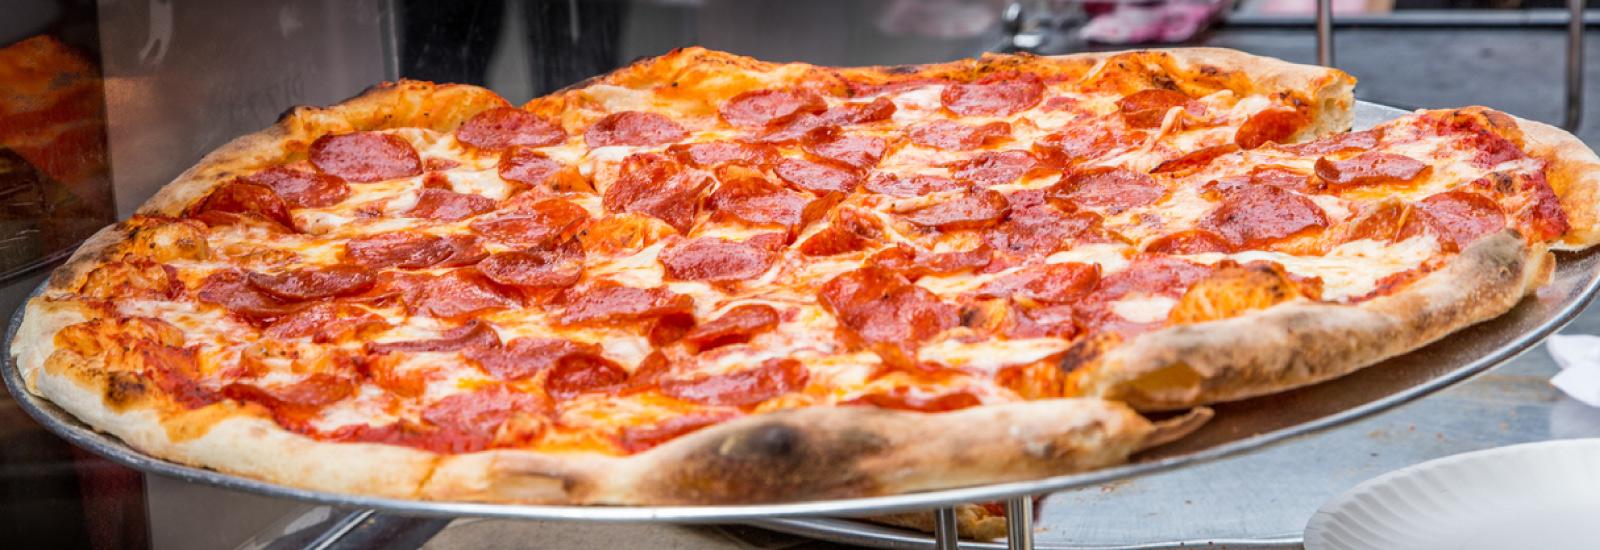 Pizza Restaurants in Pensacola, Florida